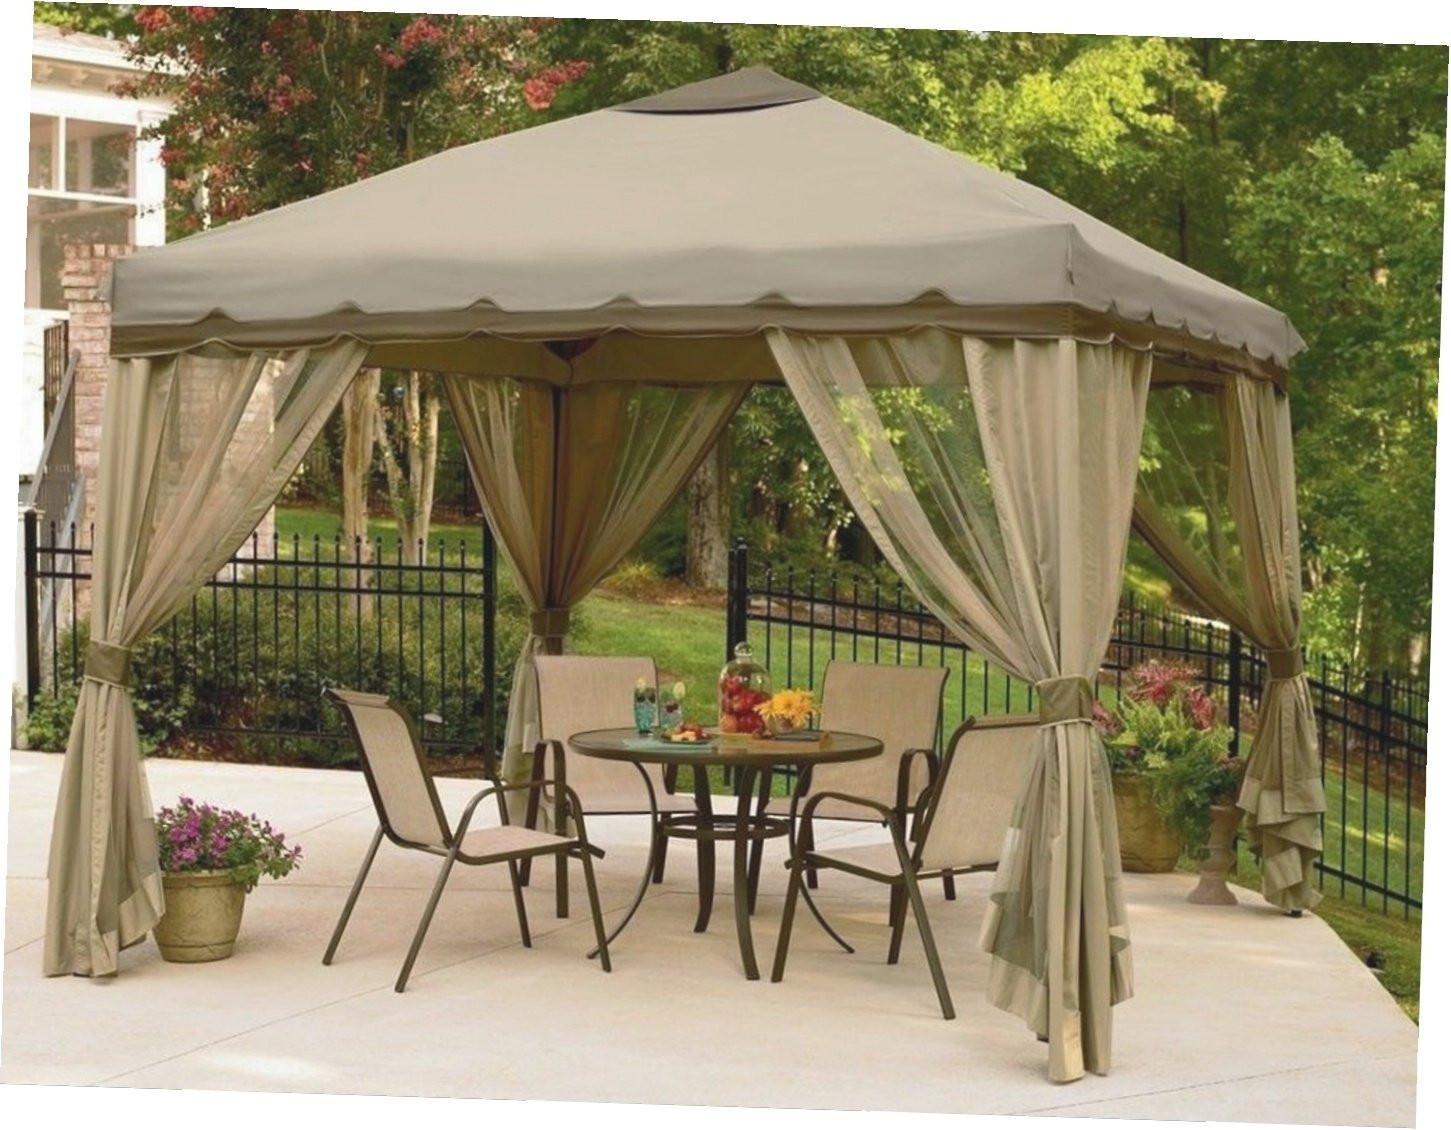 Best ideas about Backyard Creations Gazebo . Save or Pin Furnish Irresistible Backyard Creations Gazebo Getaways Now.